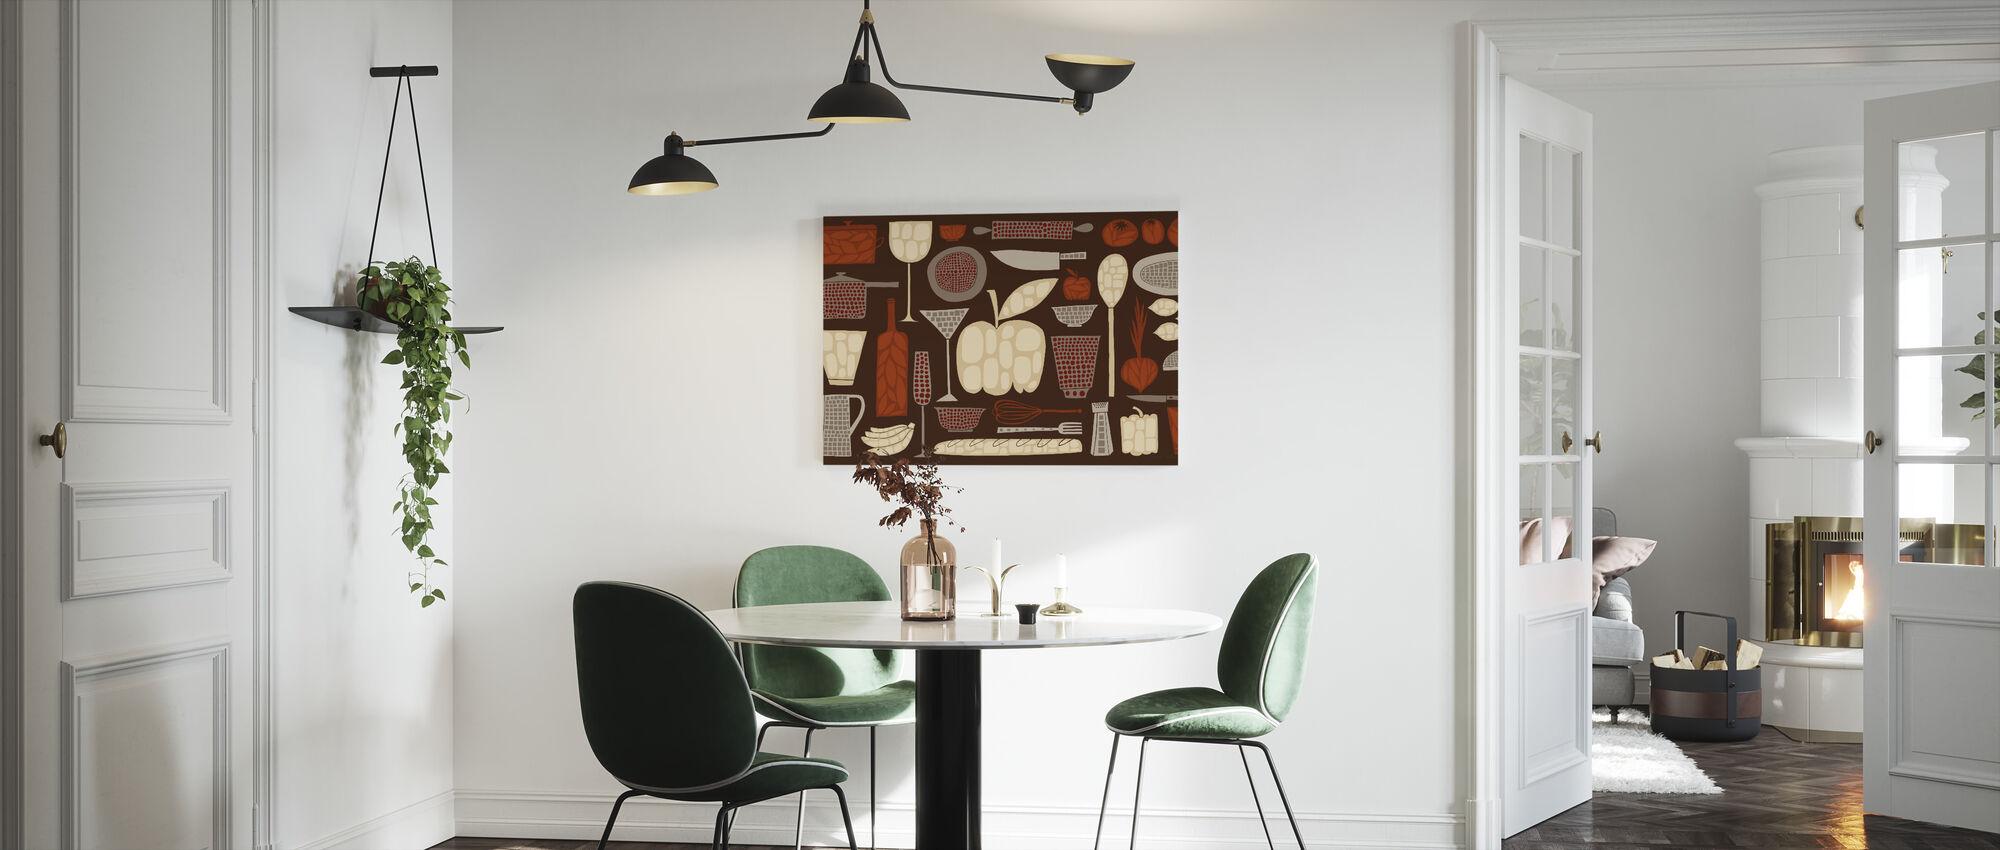 Retro Kitchen III - Canvas print - Kitchen